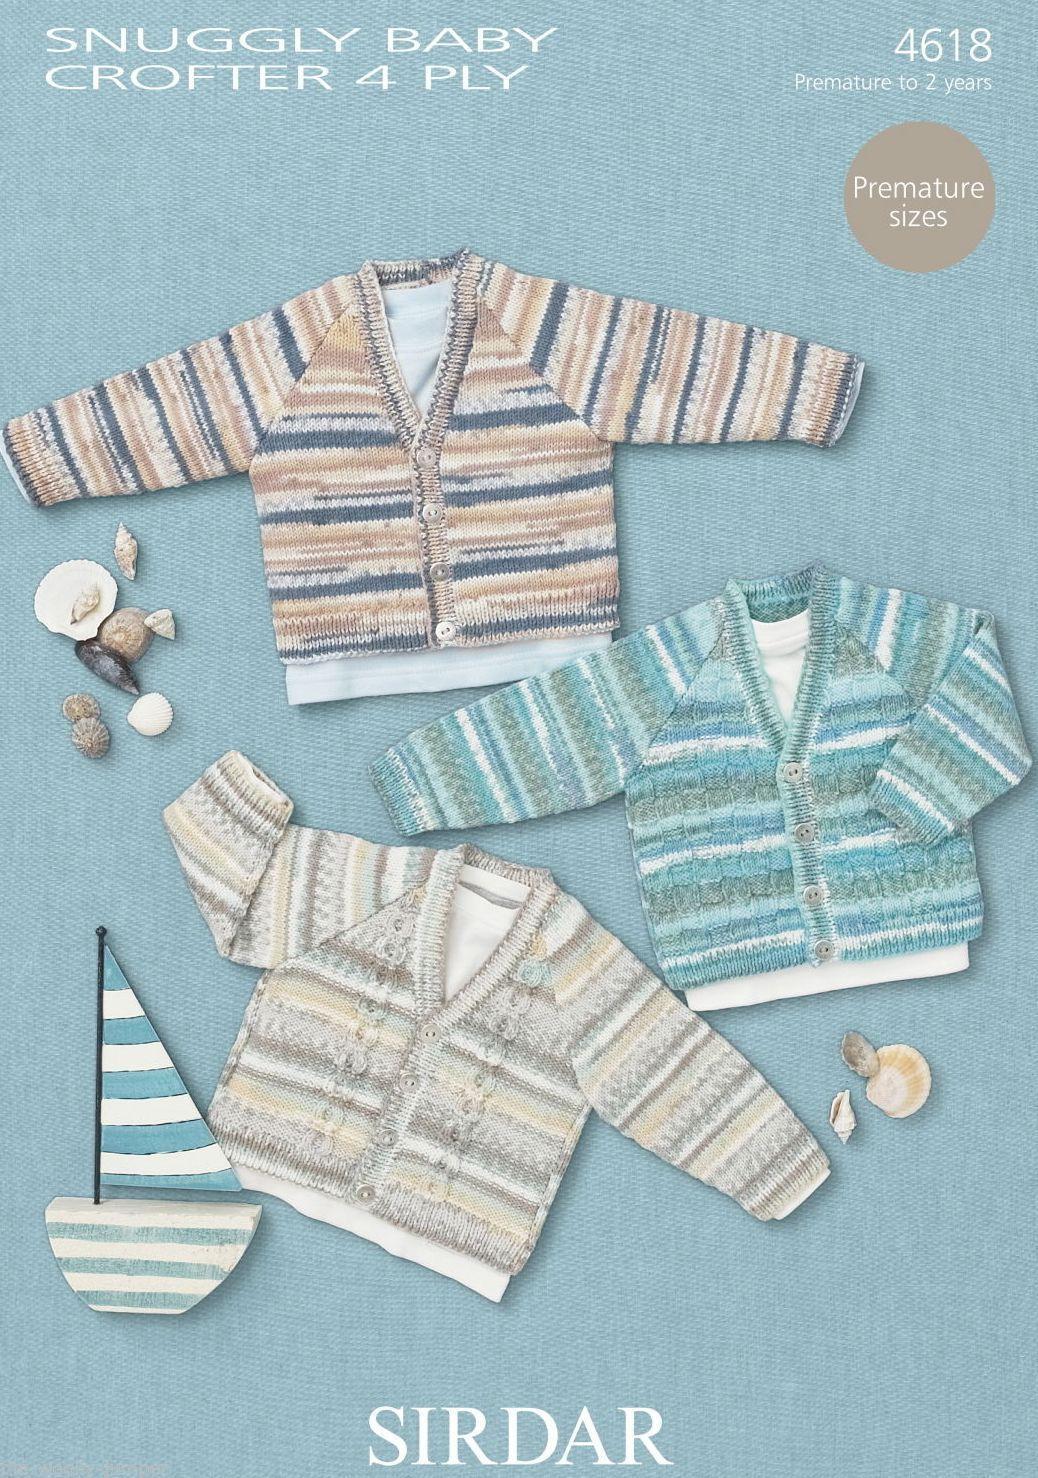 Sirdar 4 Ply Baby Knitting Patterns : 4618 - SIRDAR SNUGGLY BABY CROFTER 4 PLY CARDIGAN KNITTING PATTERN - TO FIT P...